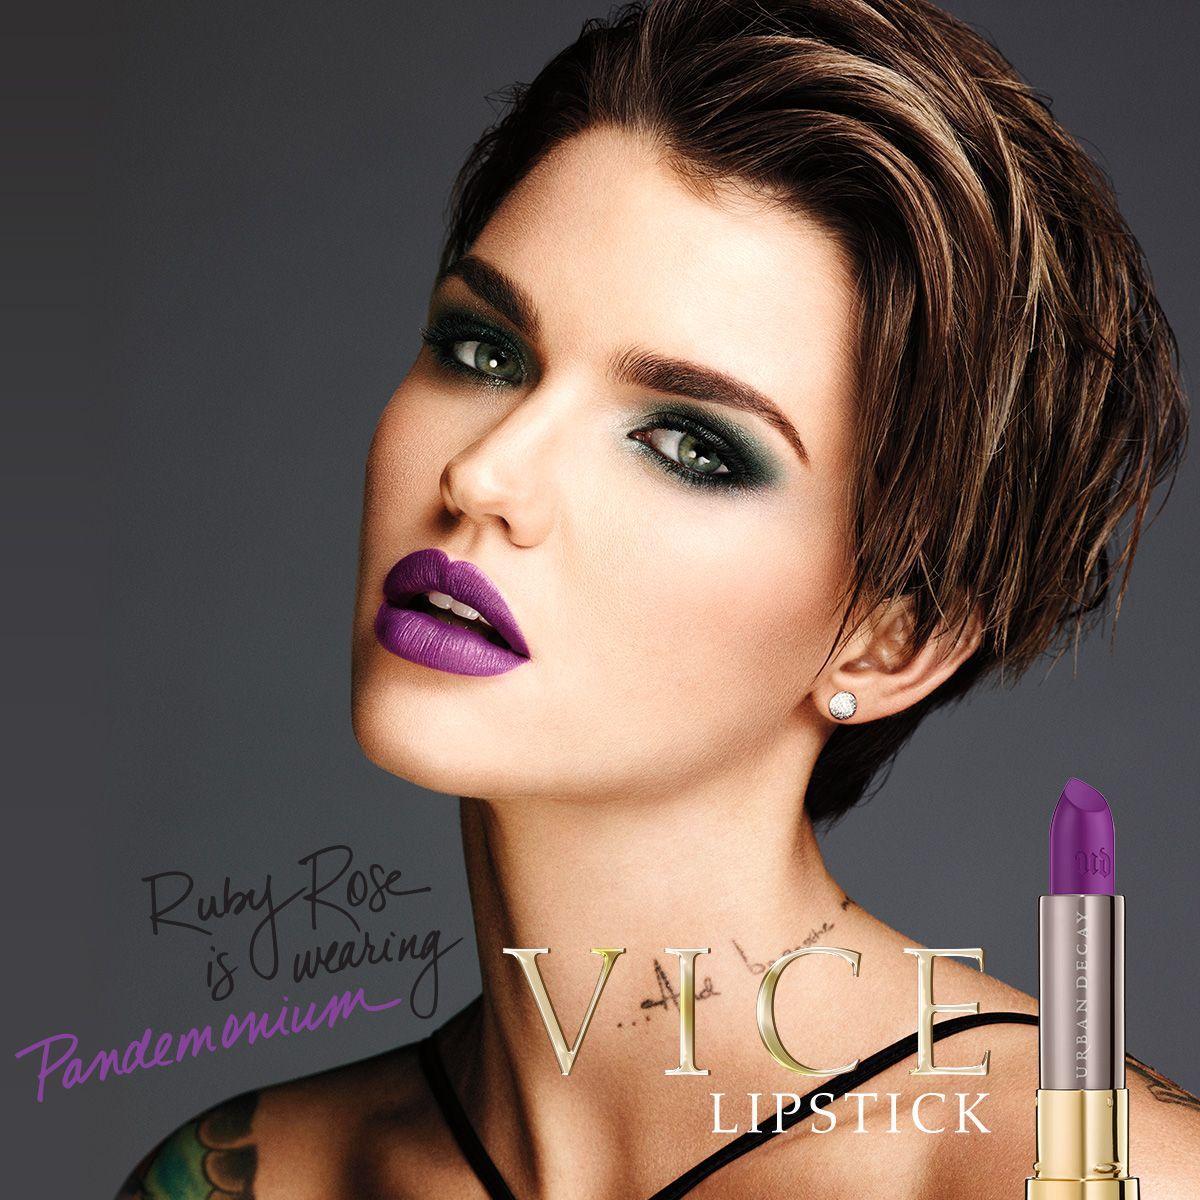 Vice Lipstick Ruby rose hair, Short hair styles, Hair styles